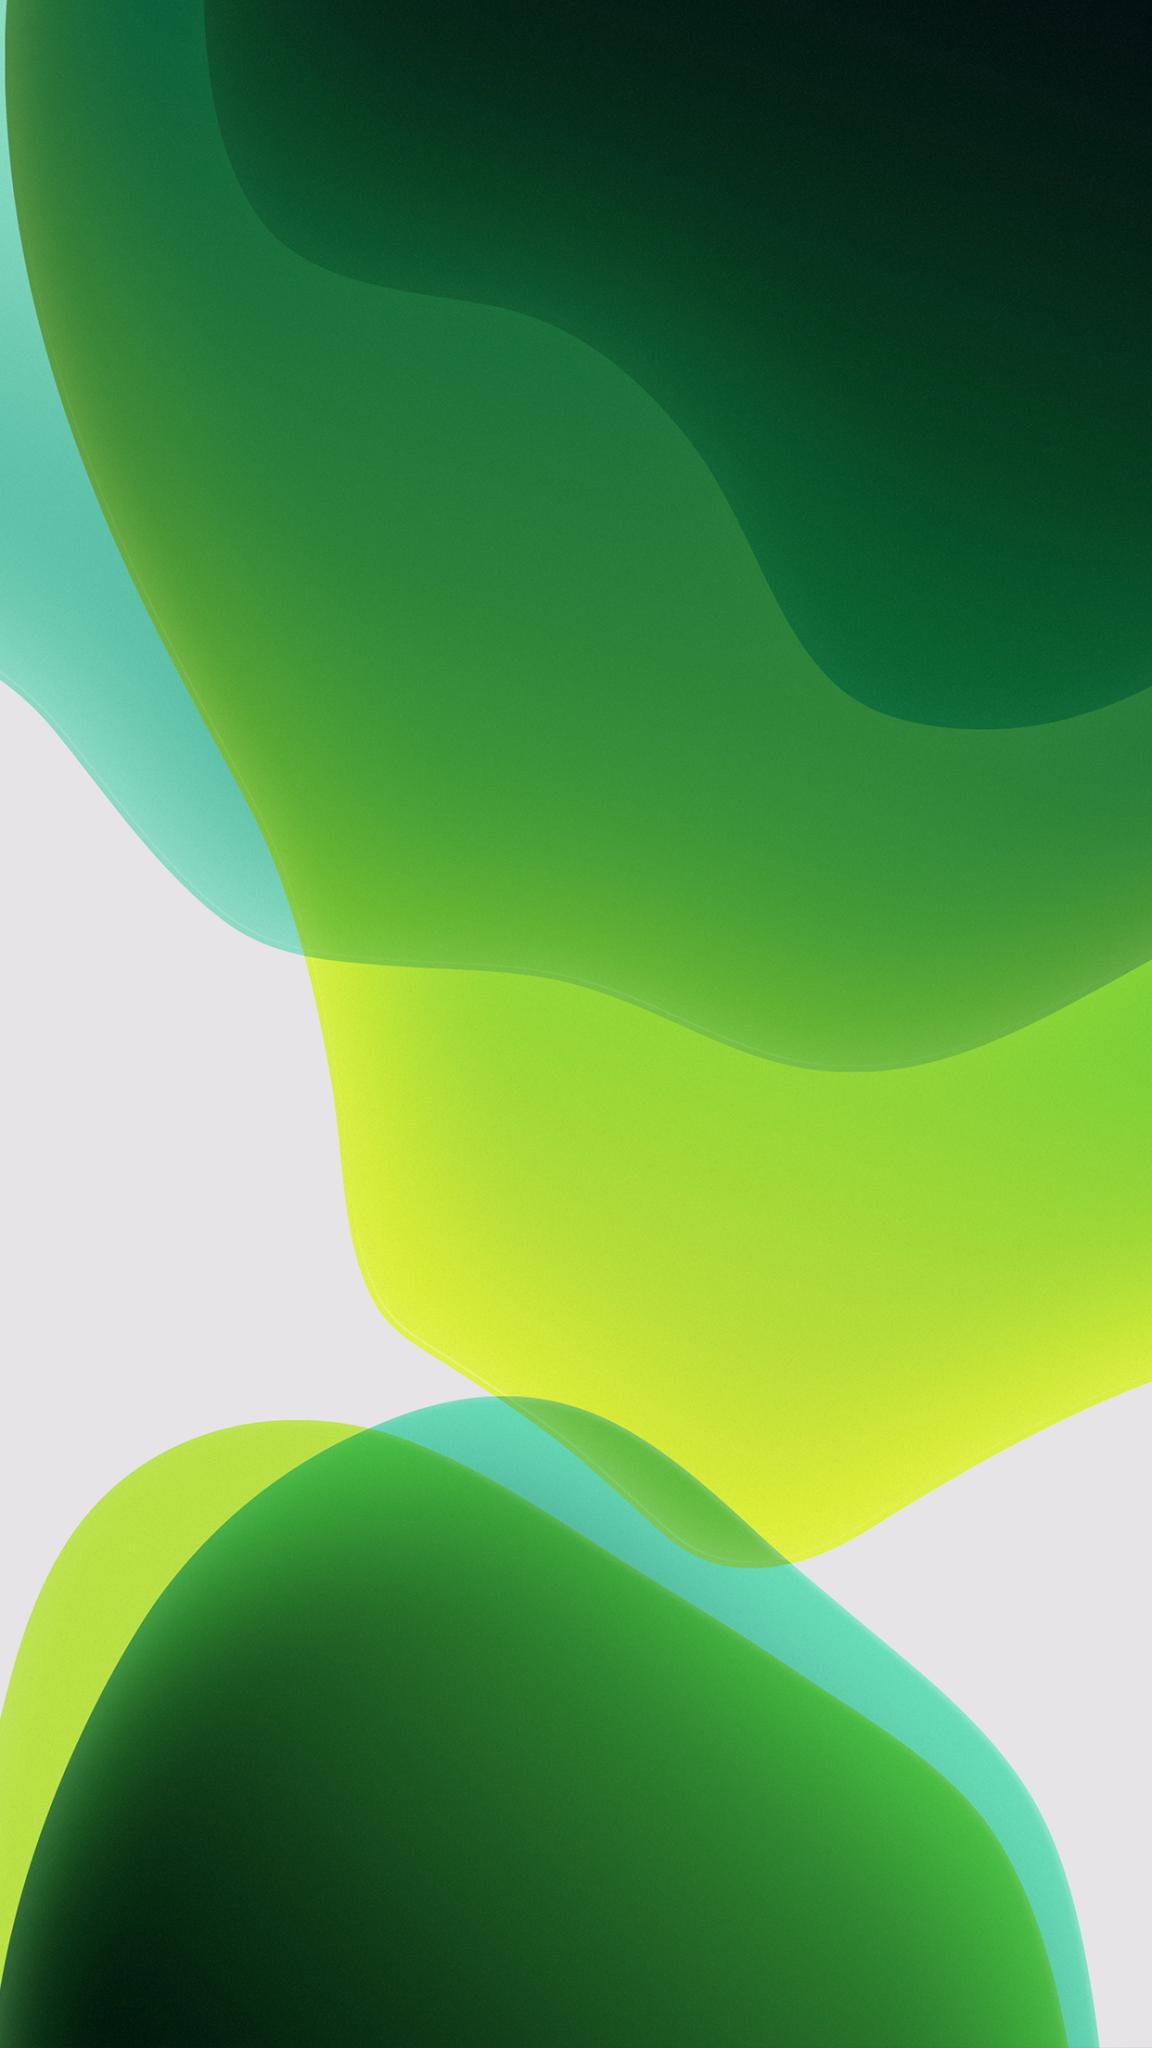 ios-13-wallpaper-TechFoogle-03